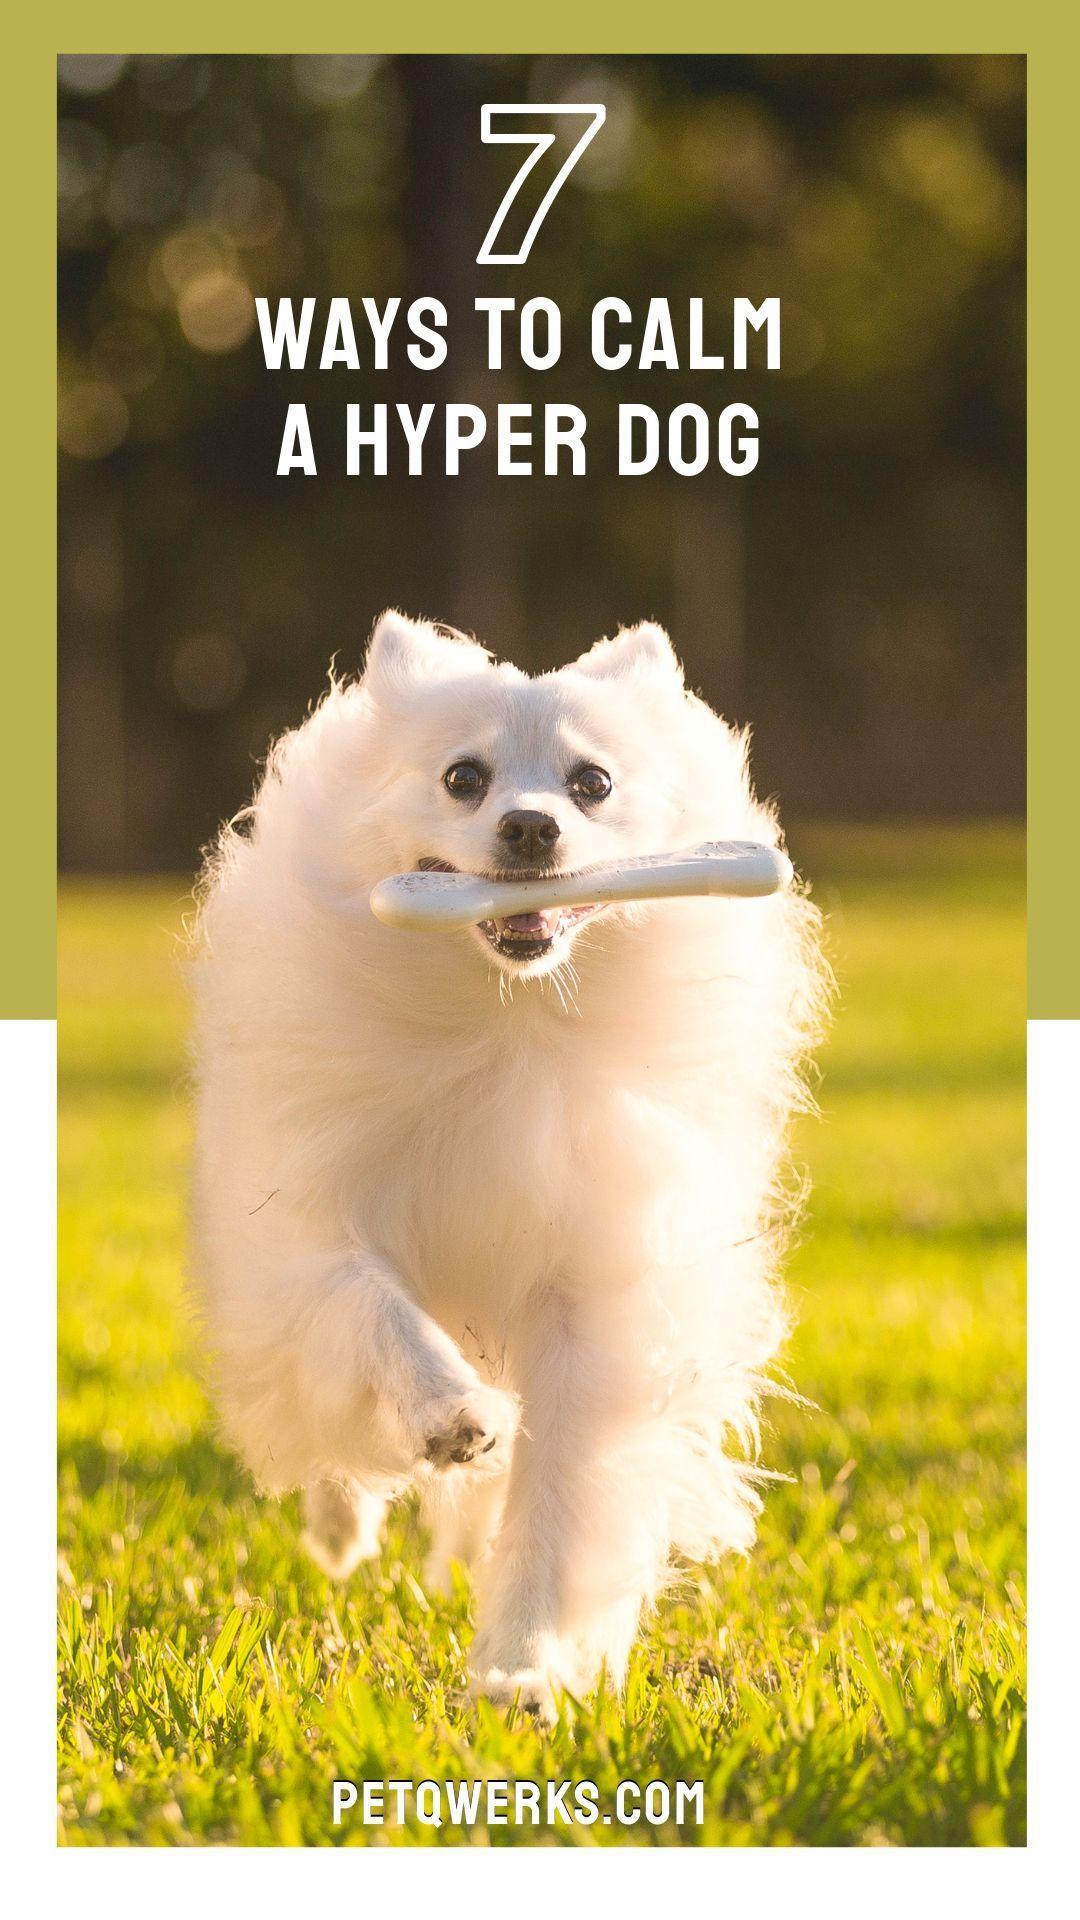 How to calm a hyper dog pet qwerks toys hyper dog